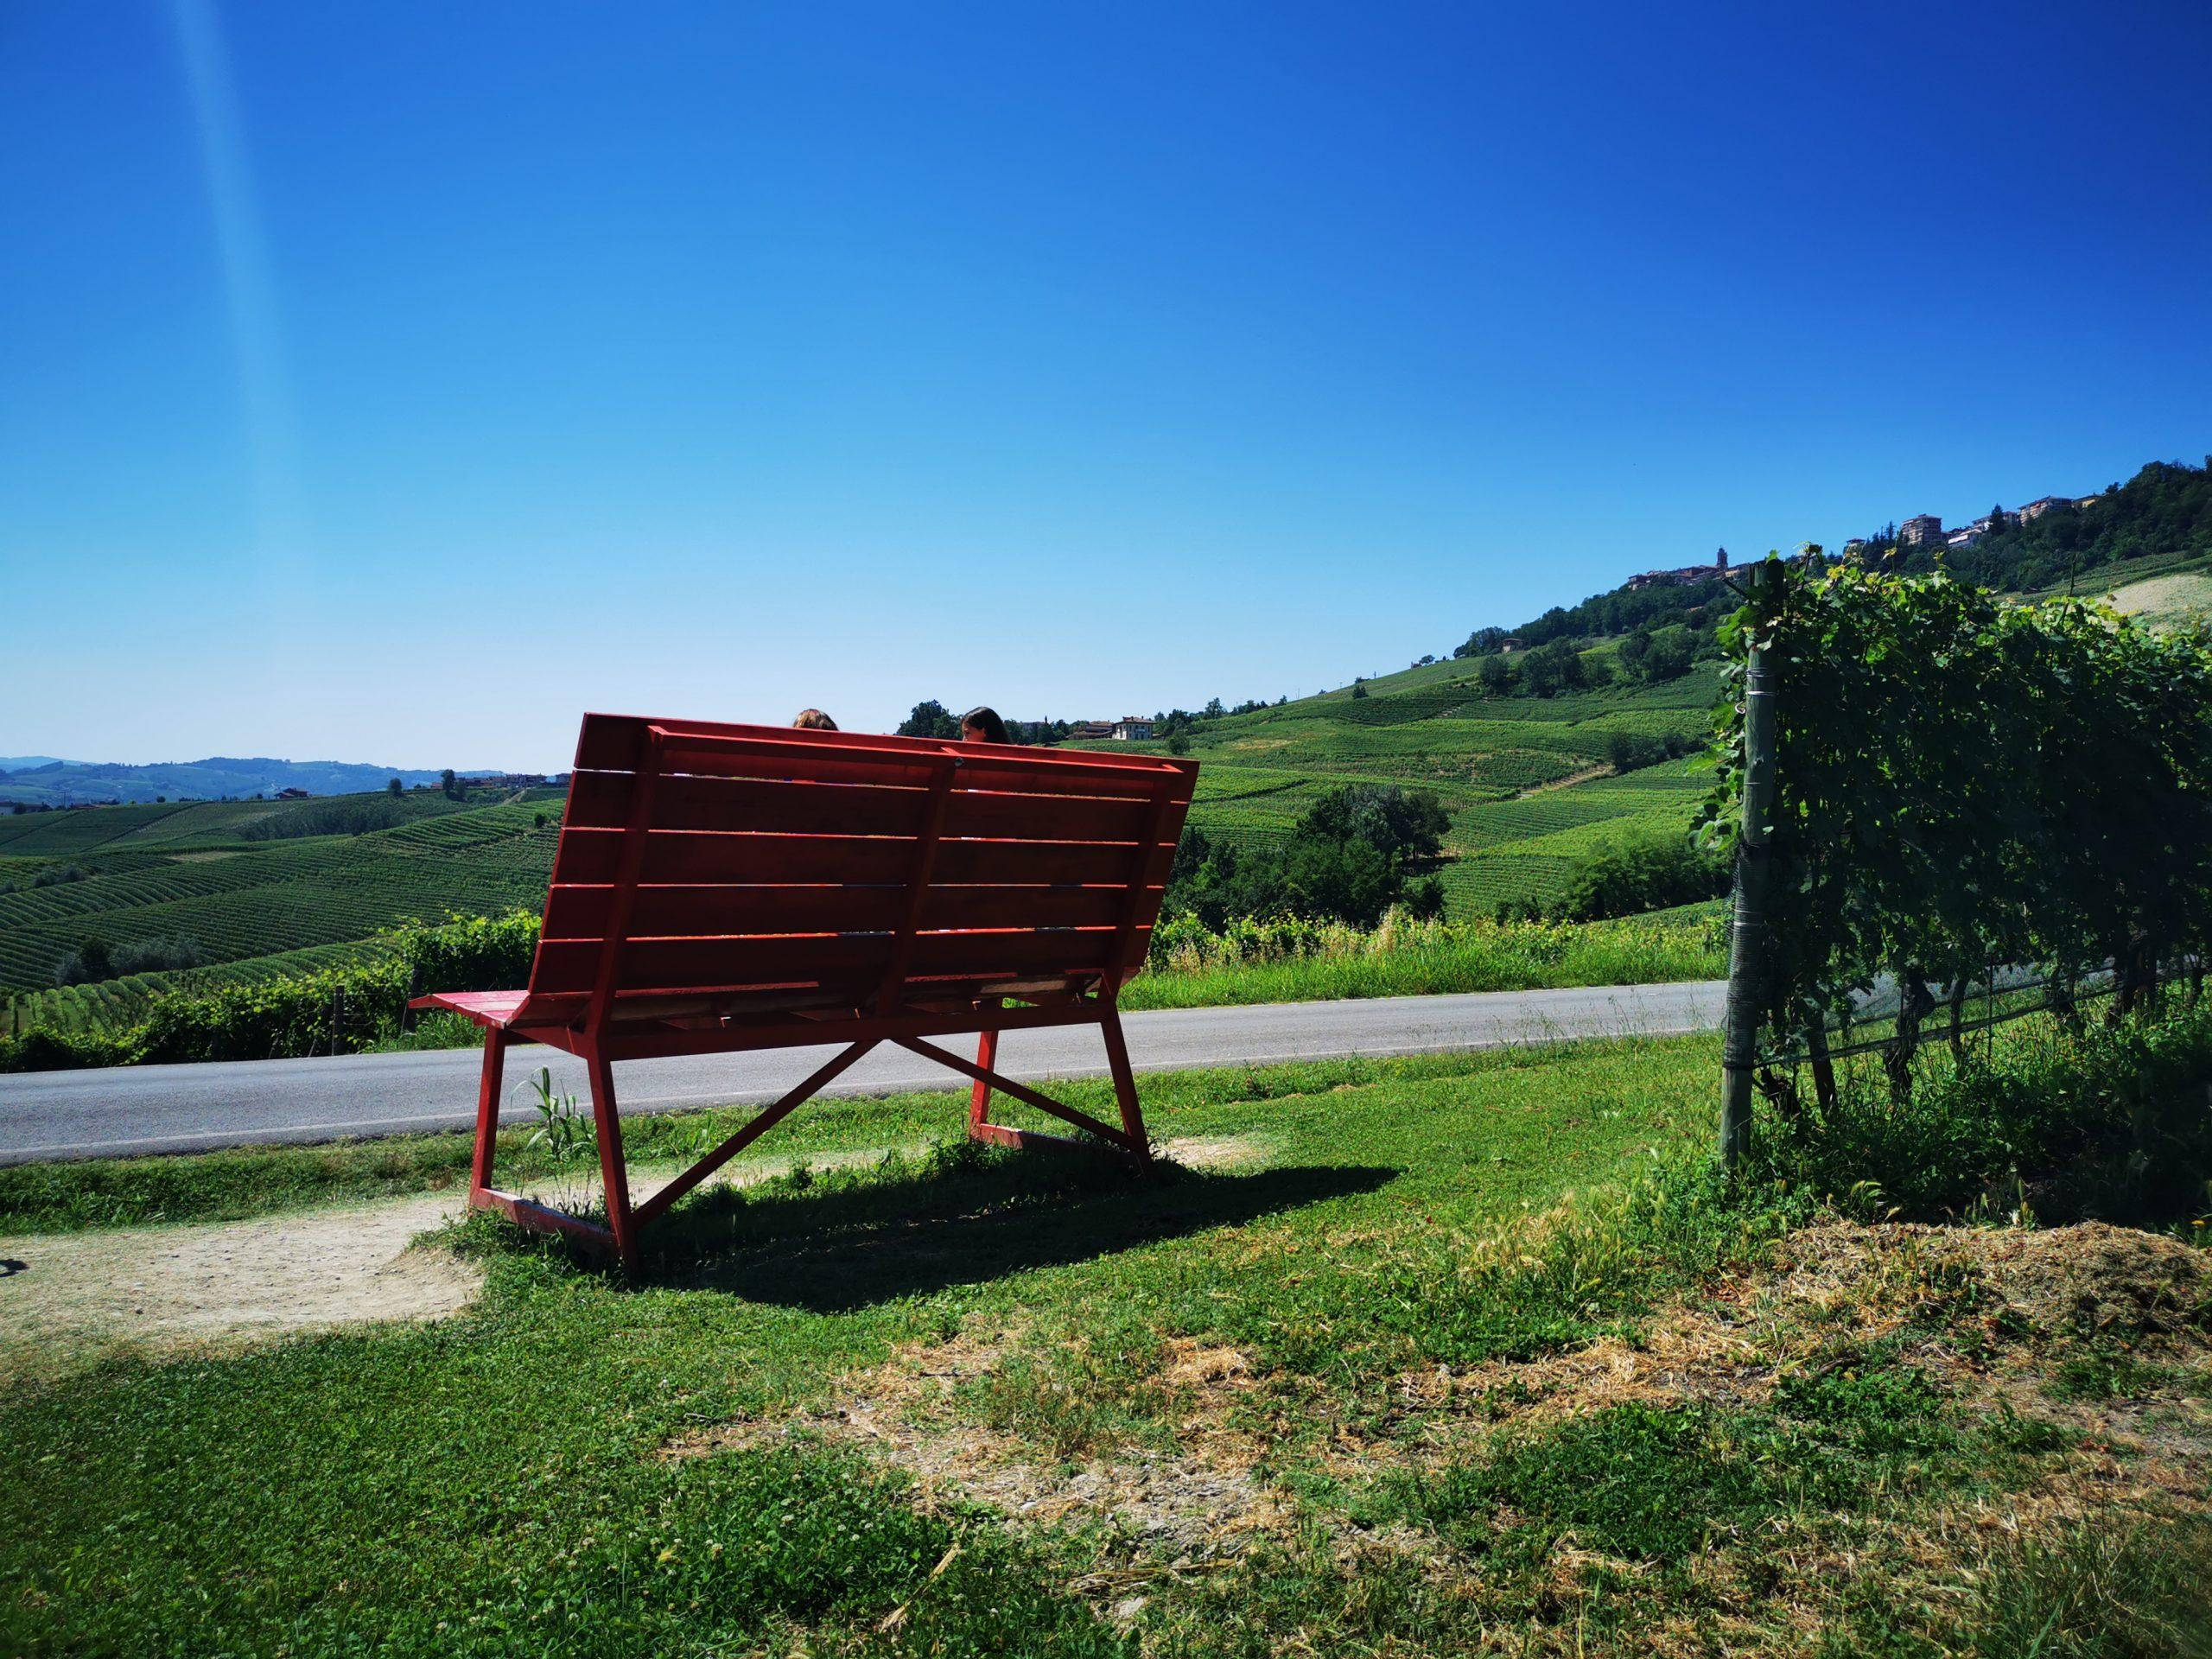 La panchina rossa a La Morra